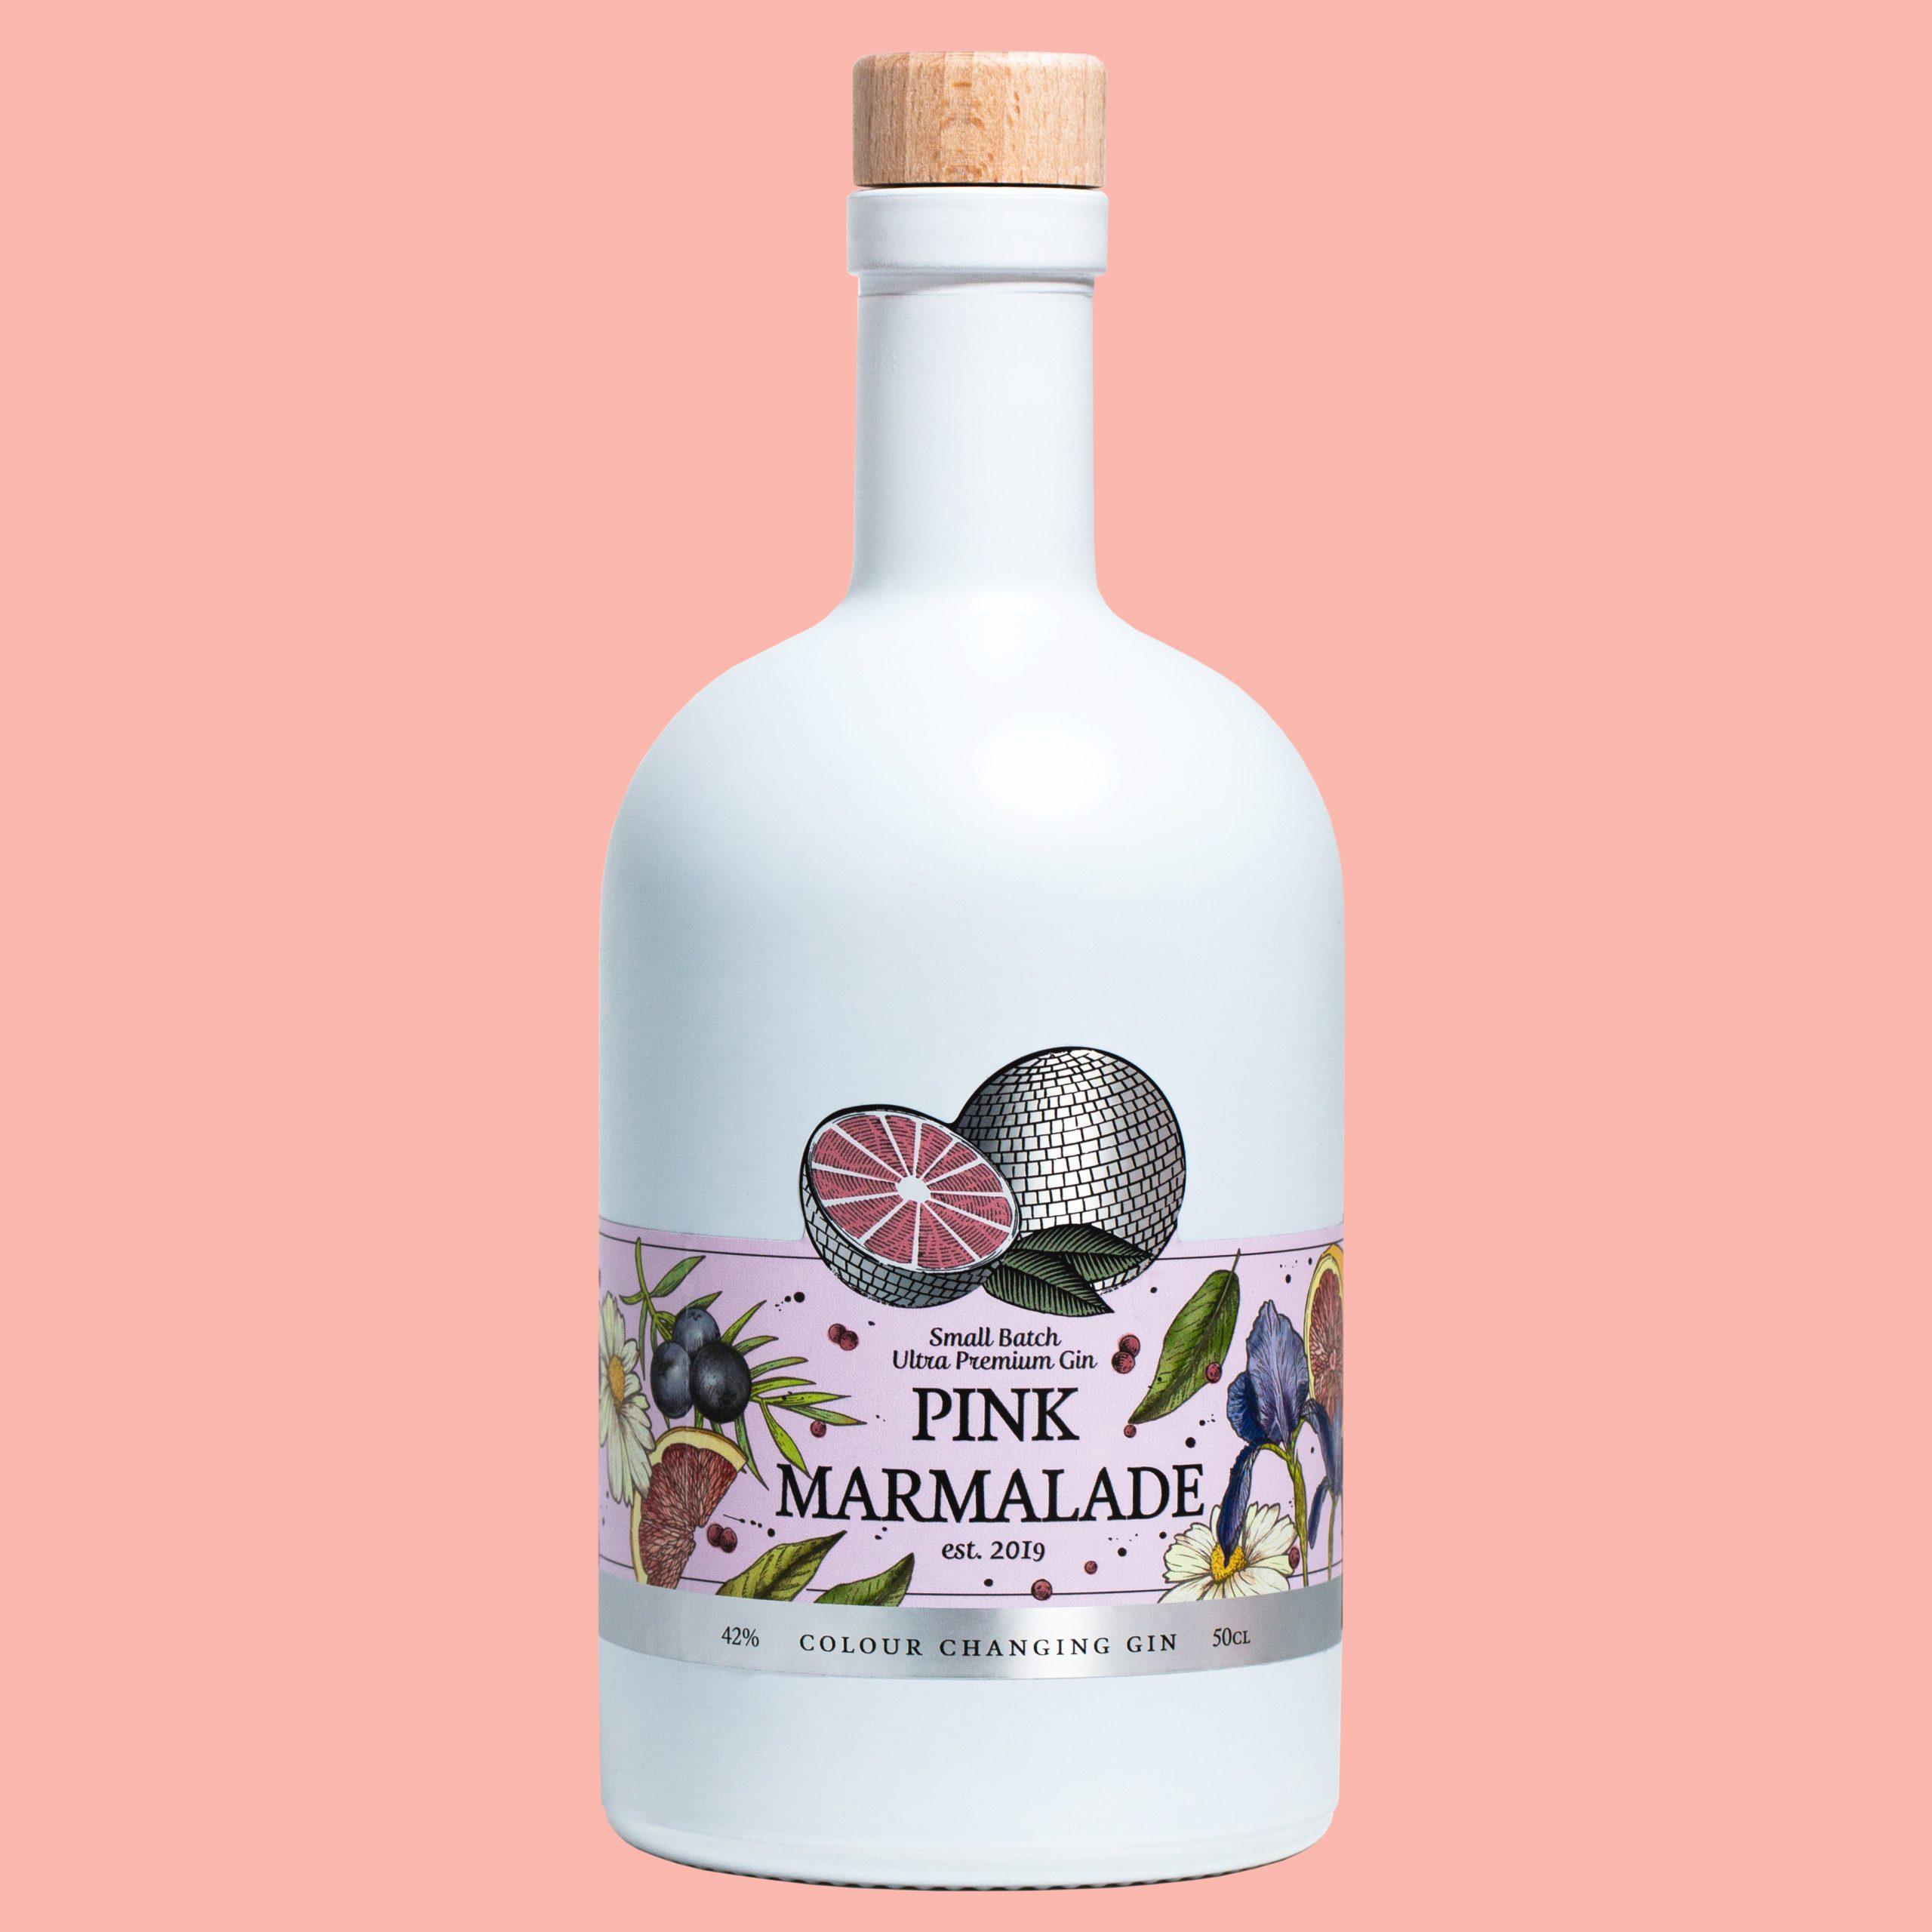 pink marmalade gin bottle